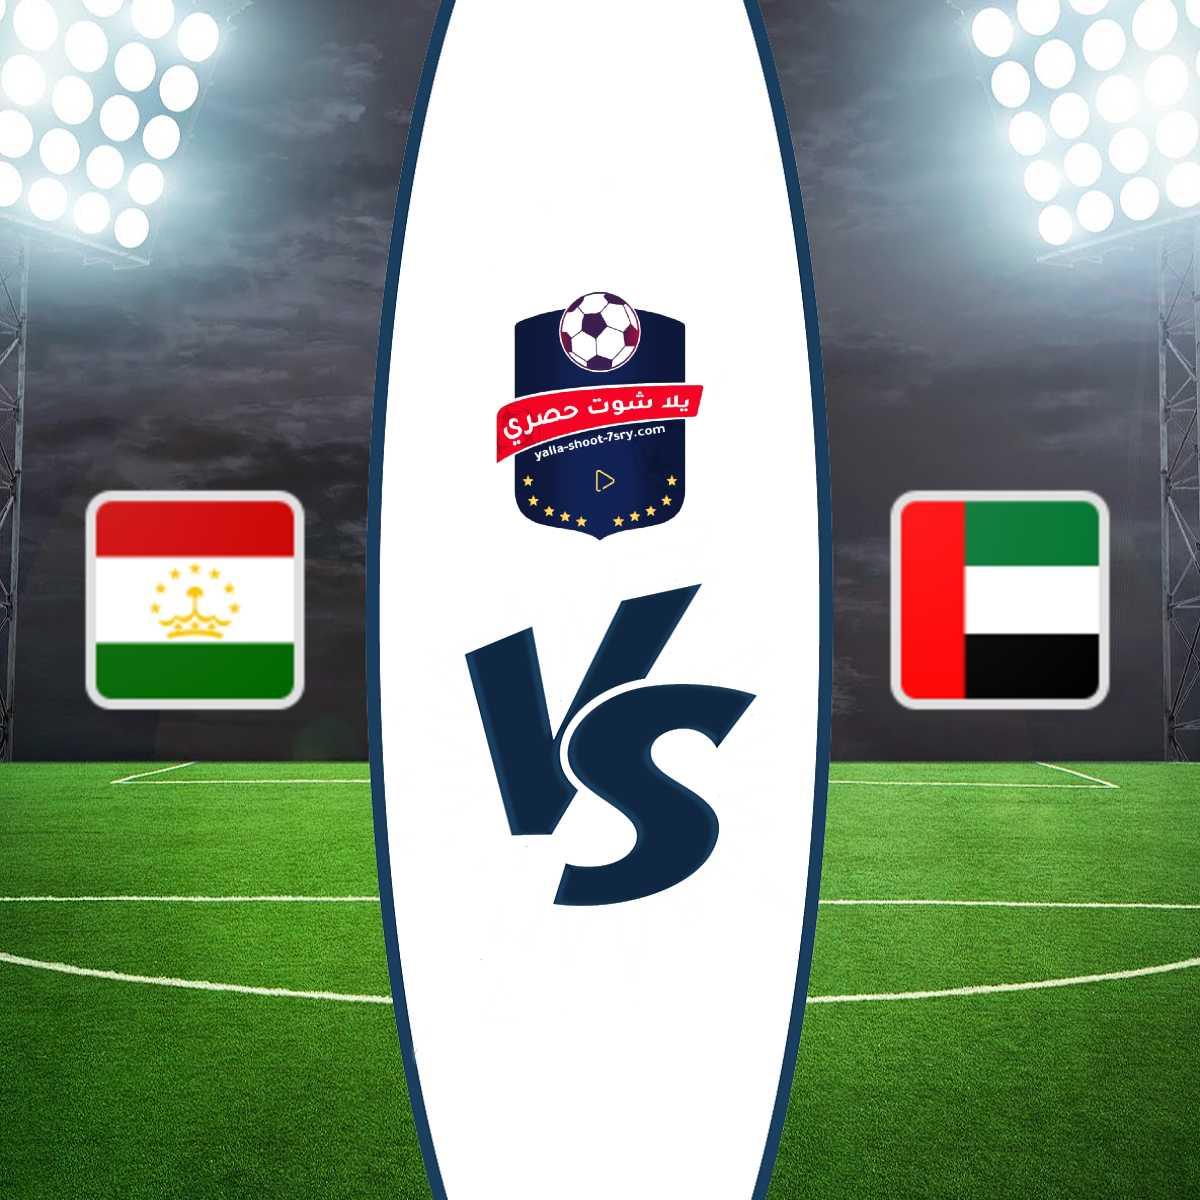 مشاهدة مباراة الامارات وطاجيكستان